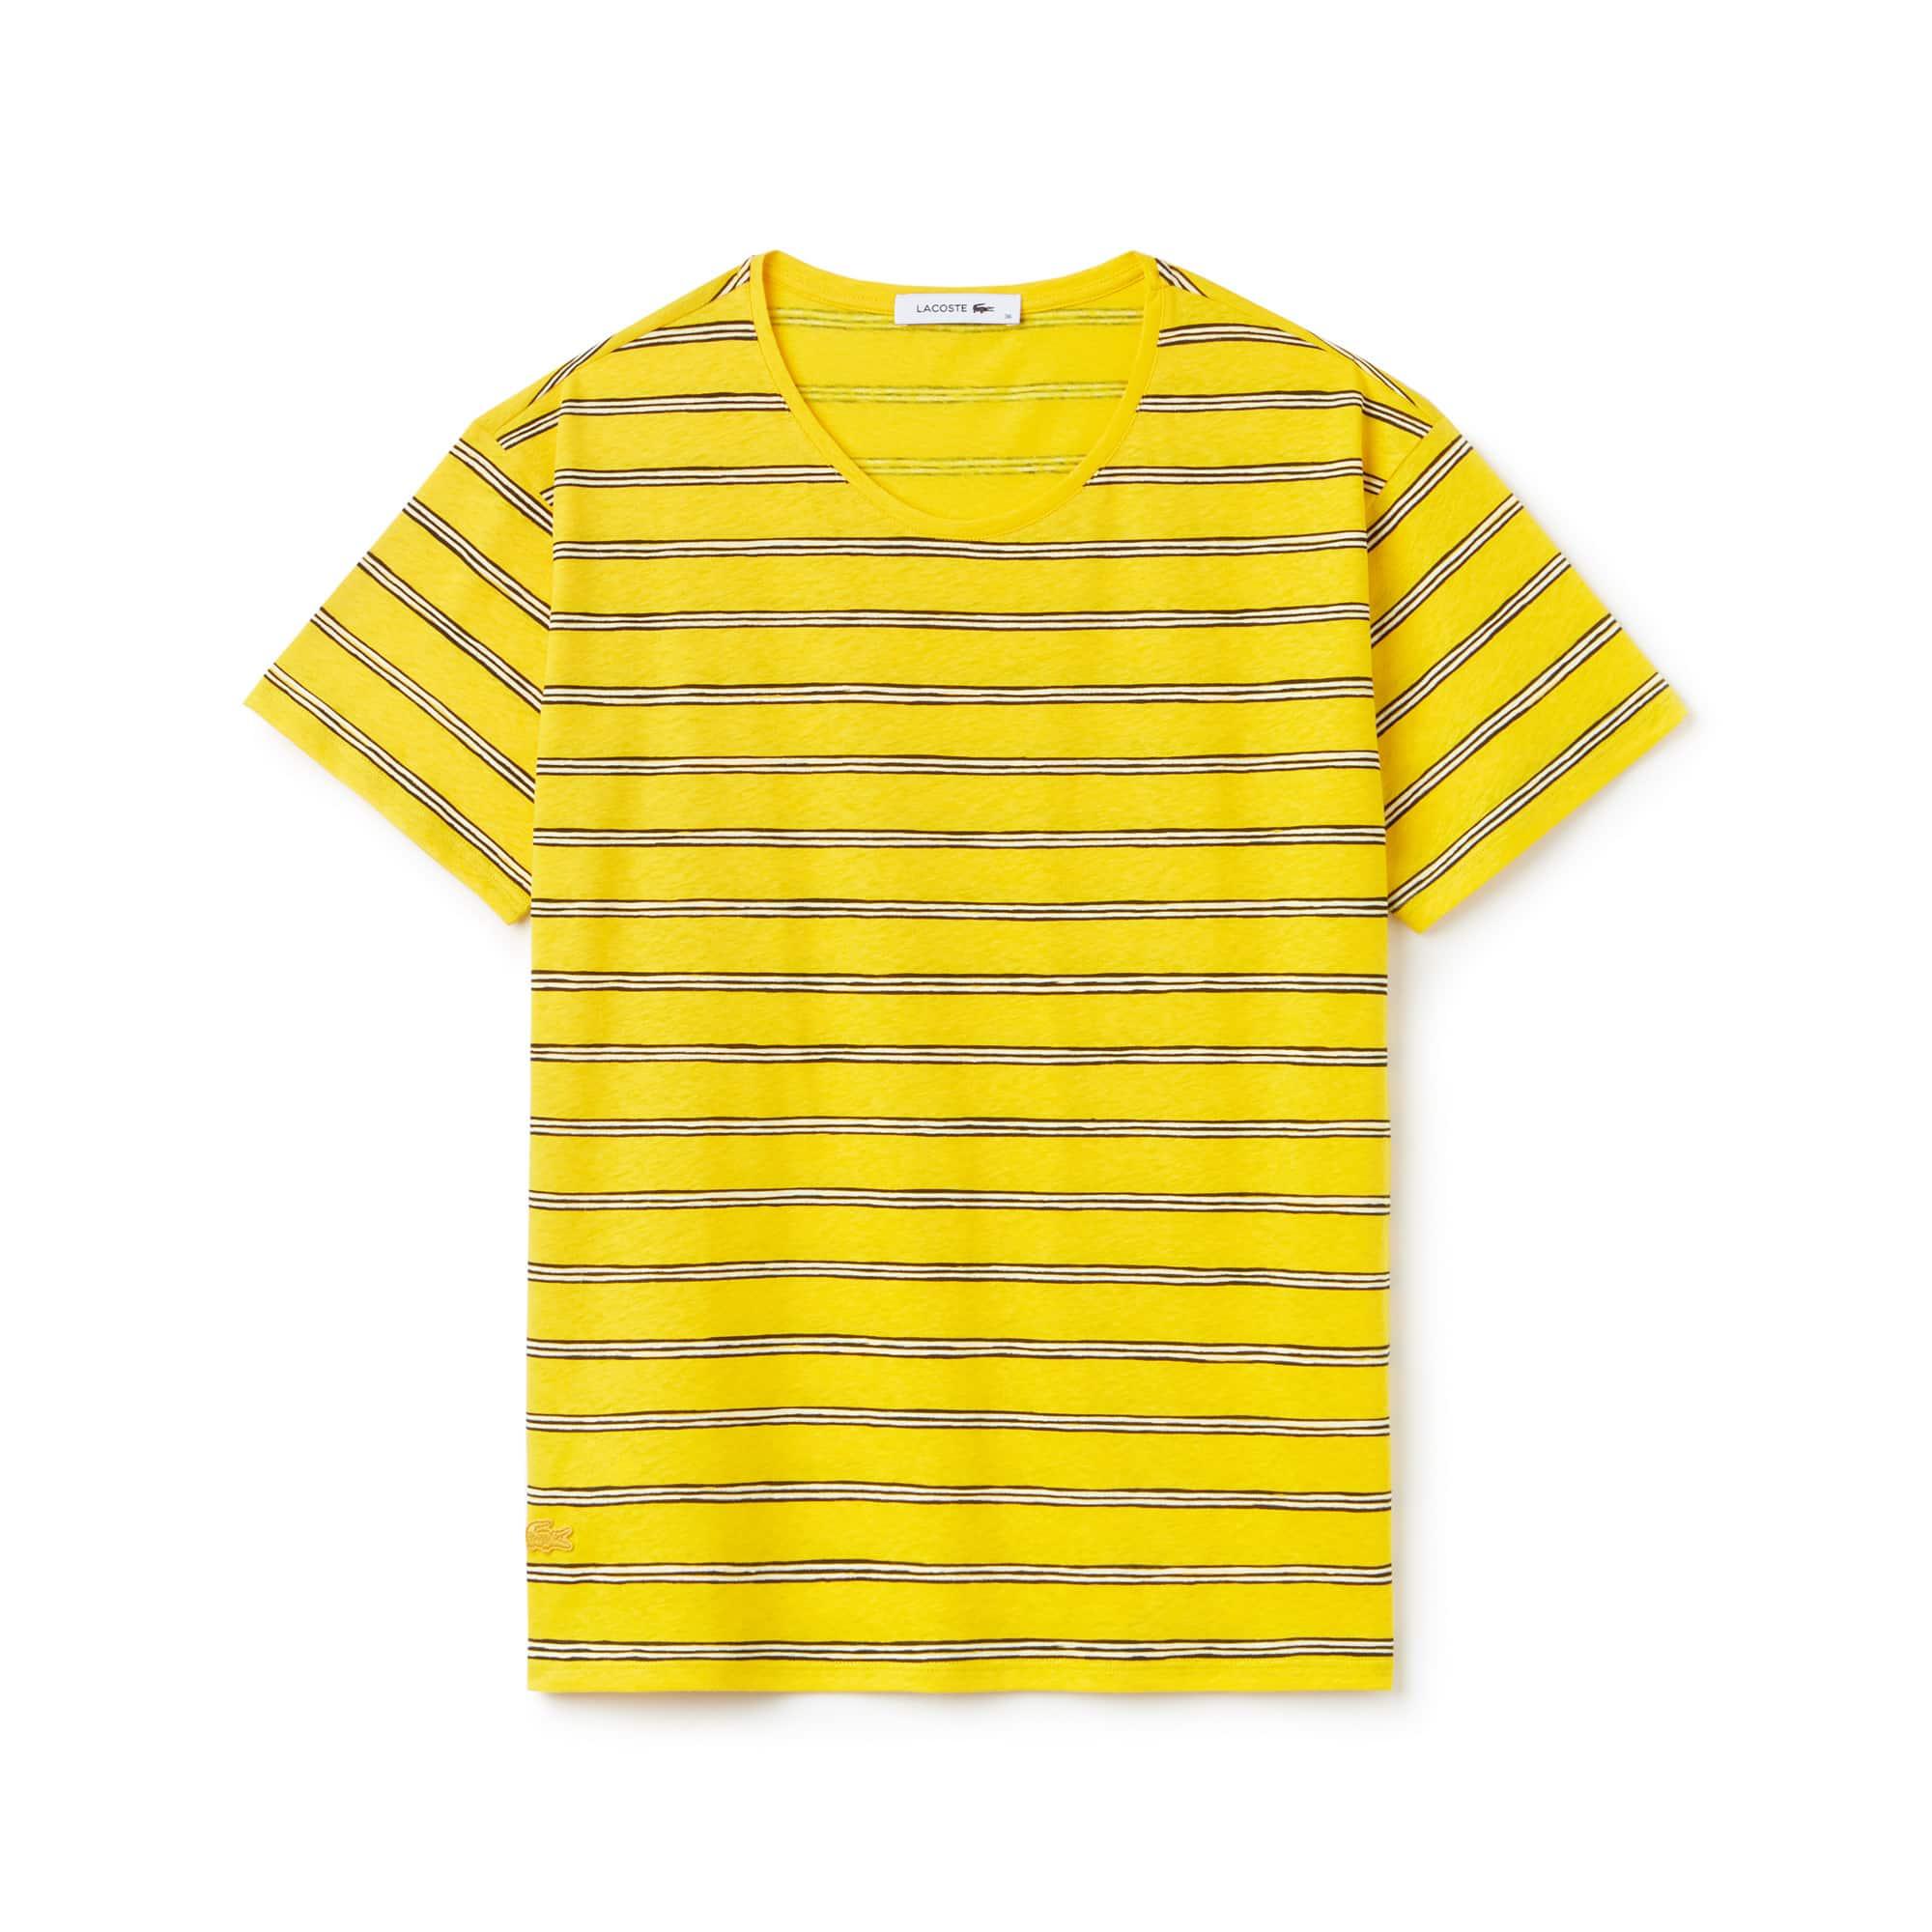 Women's Wide Neck Striped Cotton And Linen Jersey T-shirt